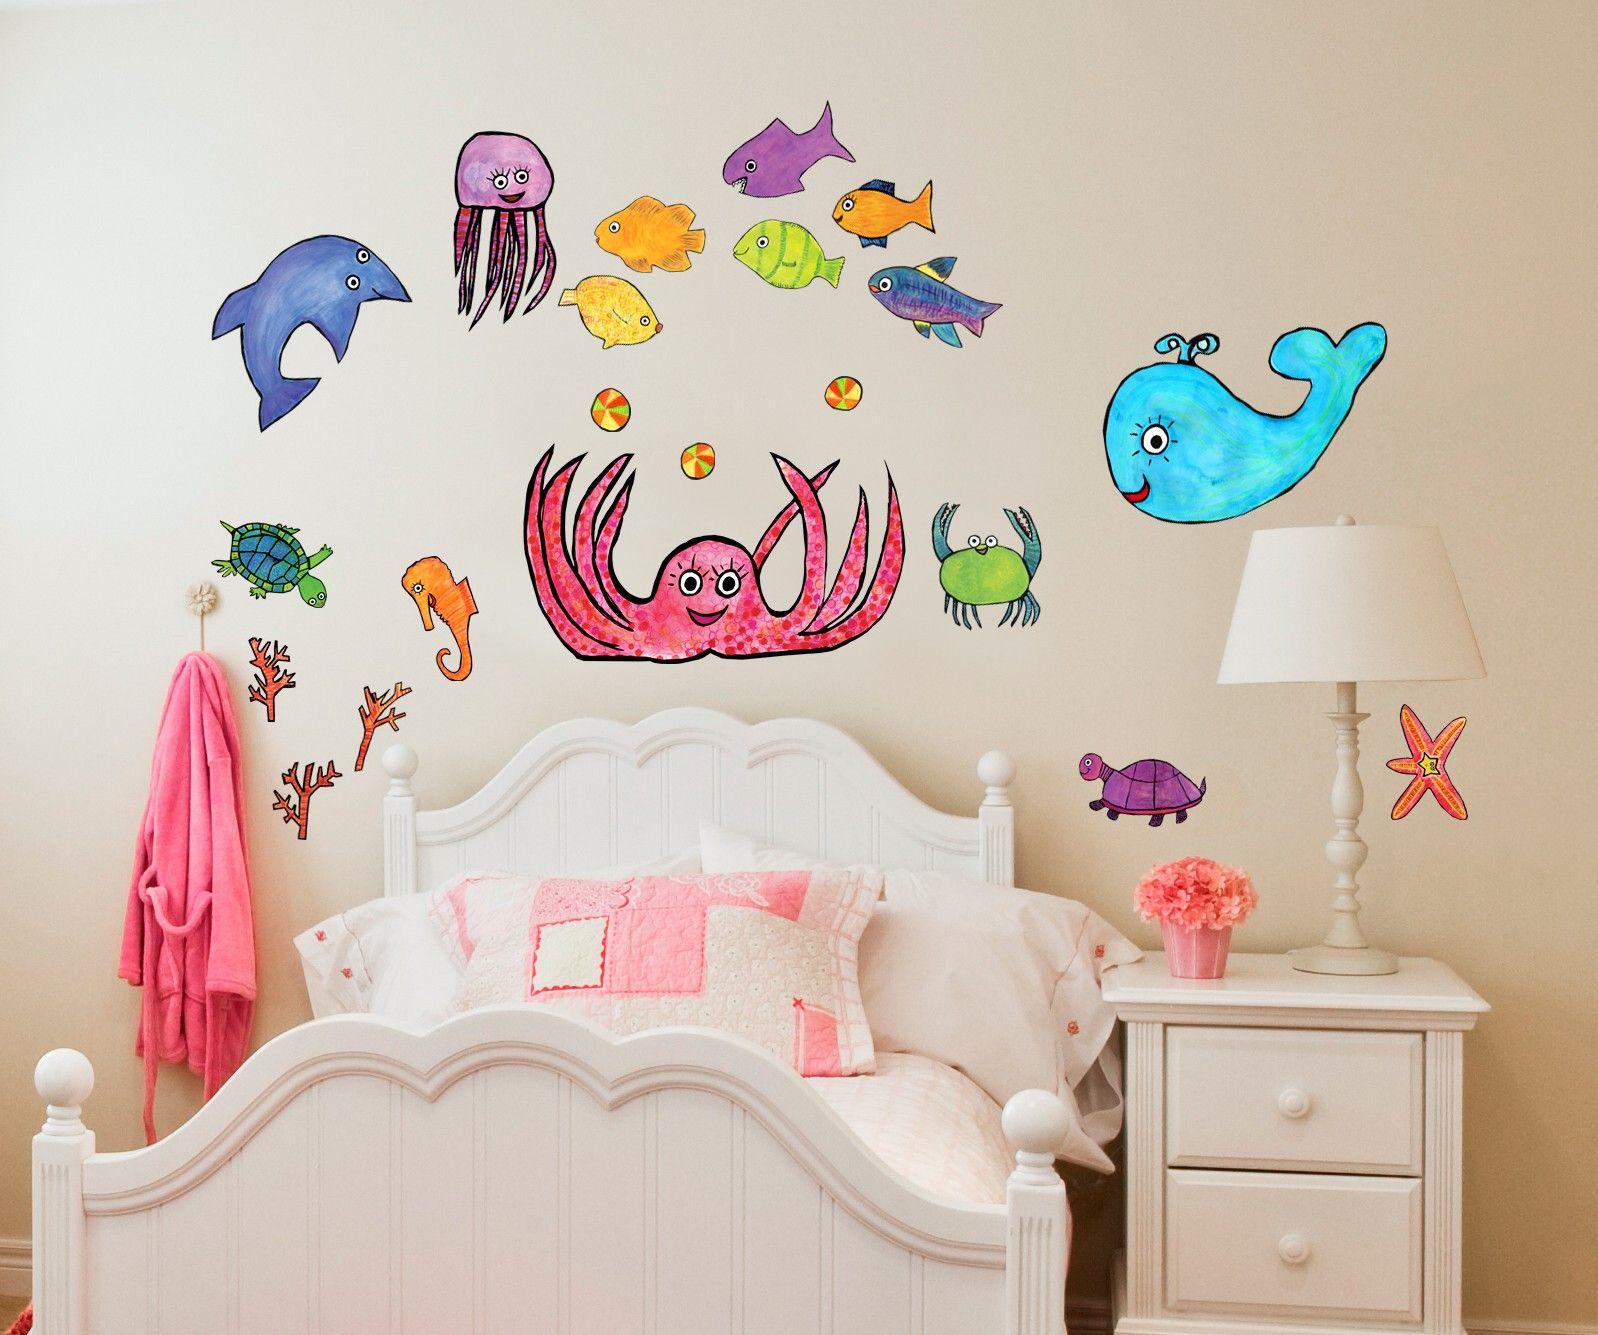 Splish Splash Girl Wall Decal Set For Kids By Emily Green For Oopsy Daisy Fine Art For Kids Baby Wall Art Girls Wall Decals Kids Wall Decals